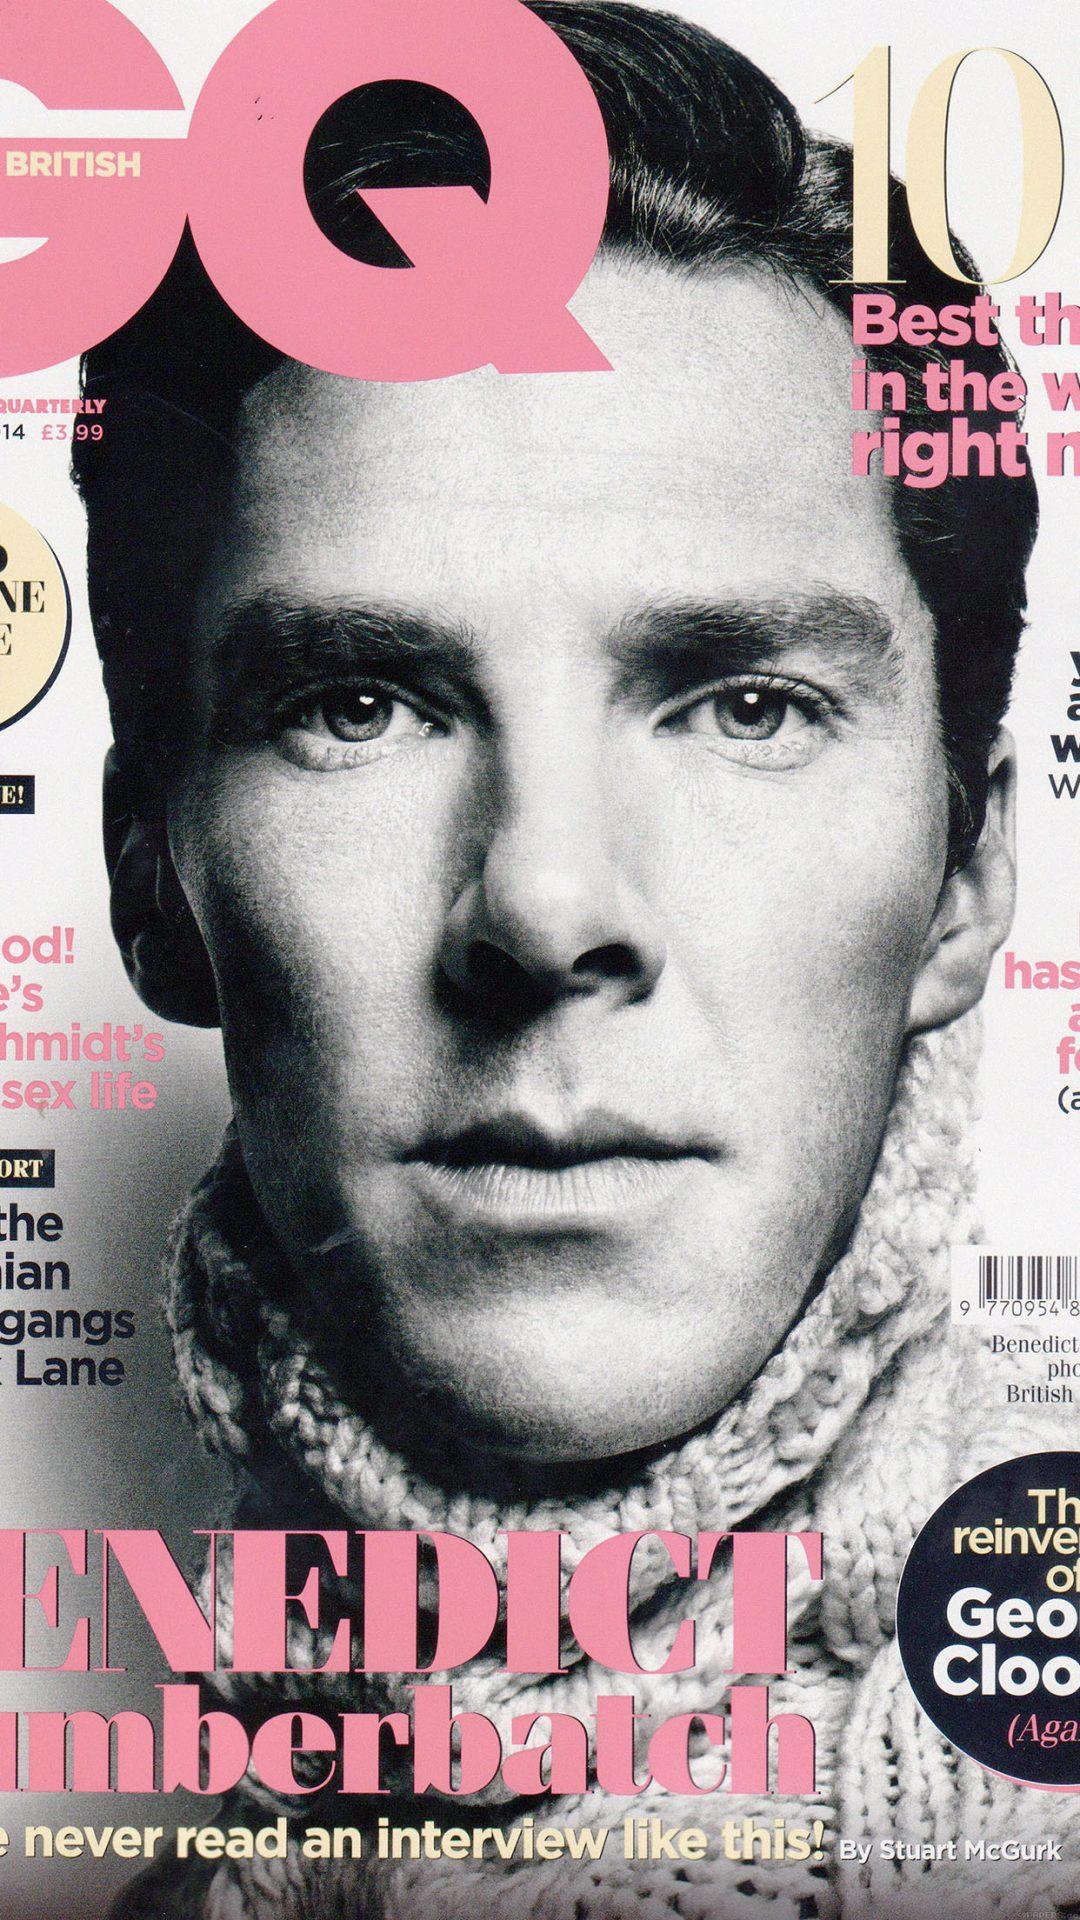 Wallpaper Gq Benedict Cumberbatch Face Film